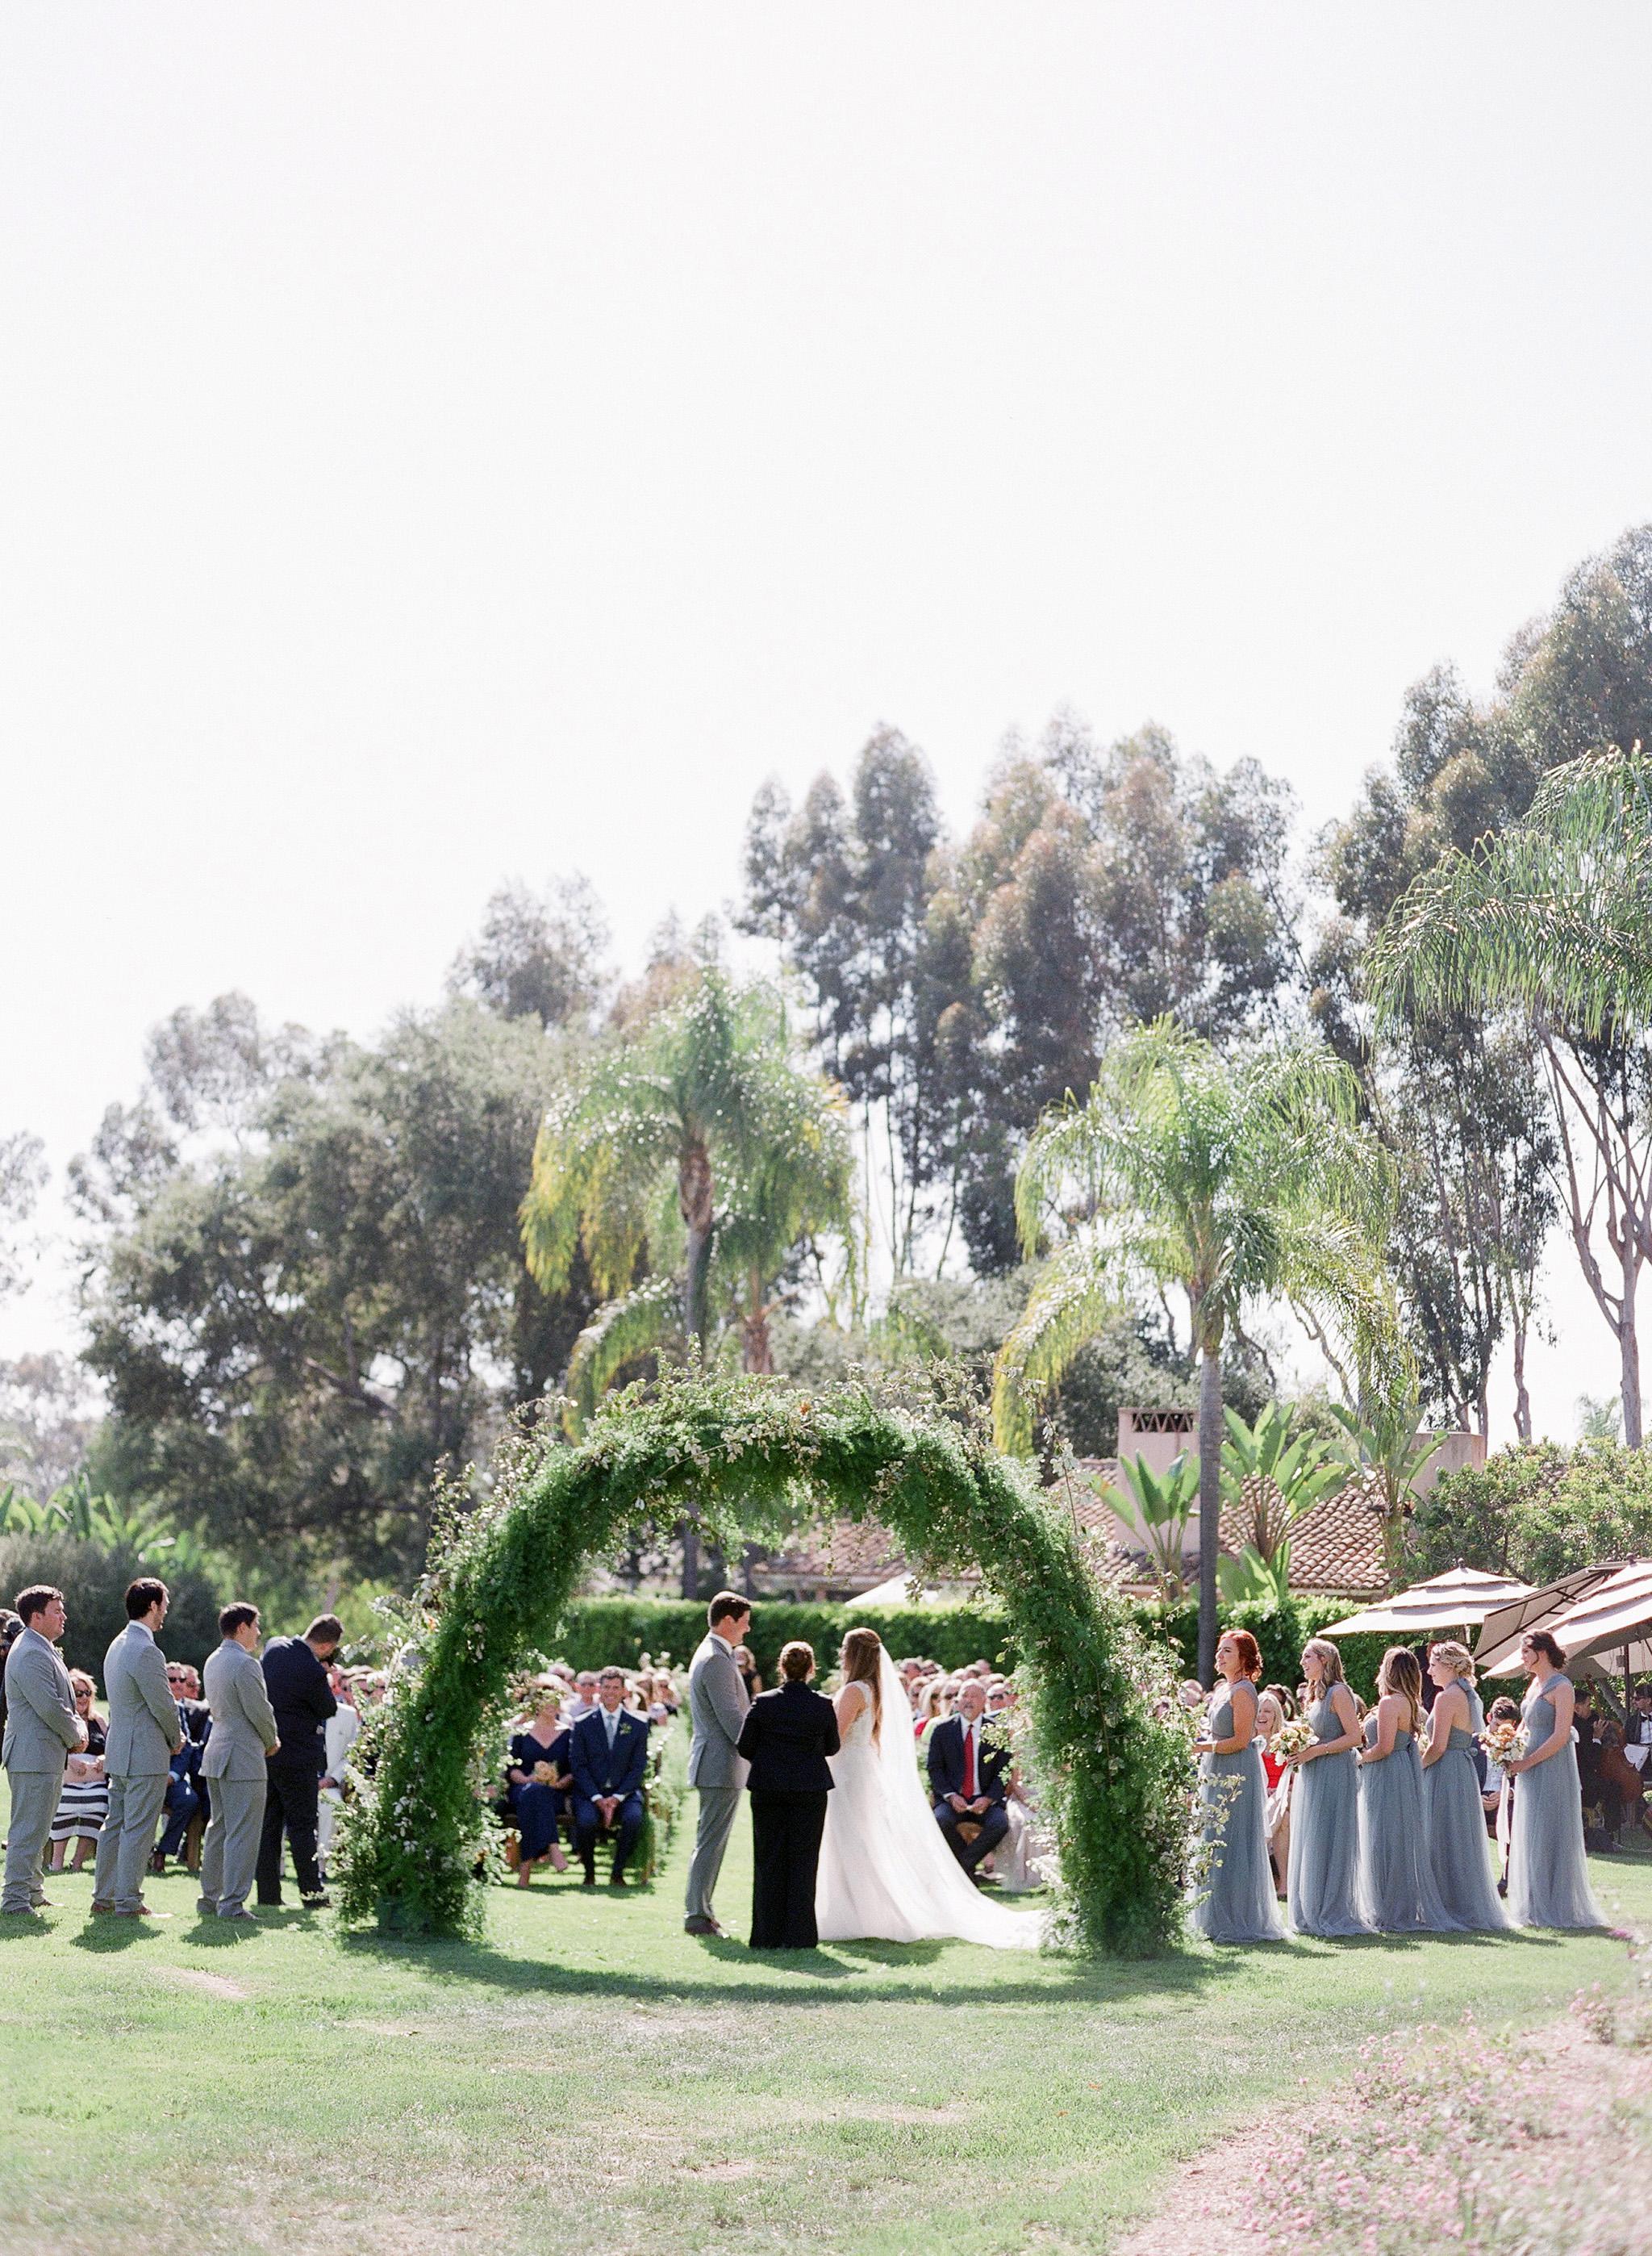 ceremony back view